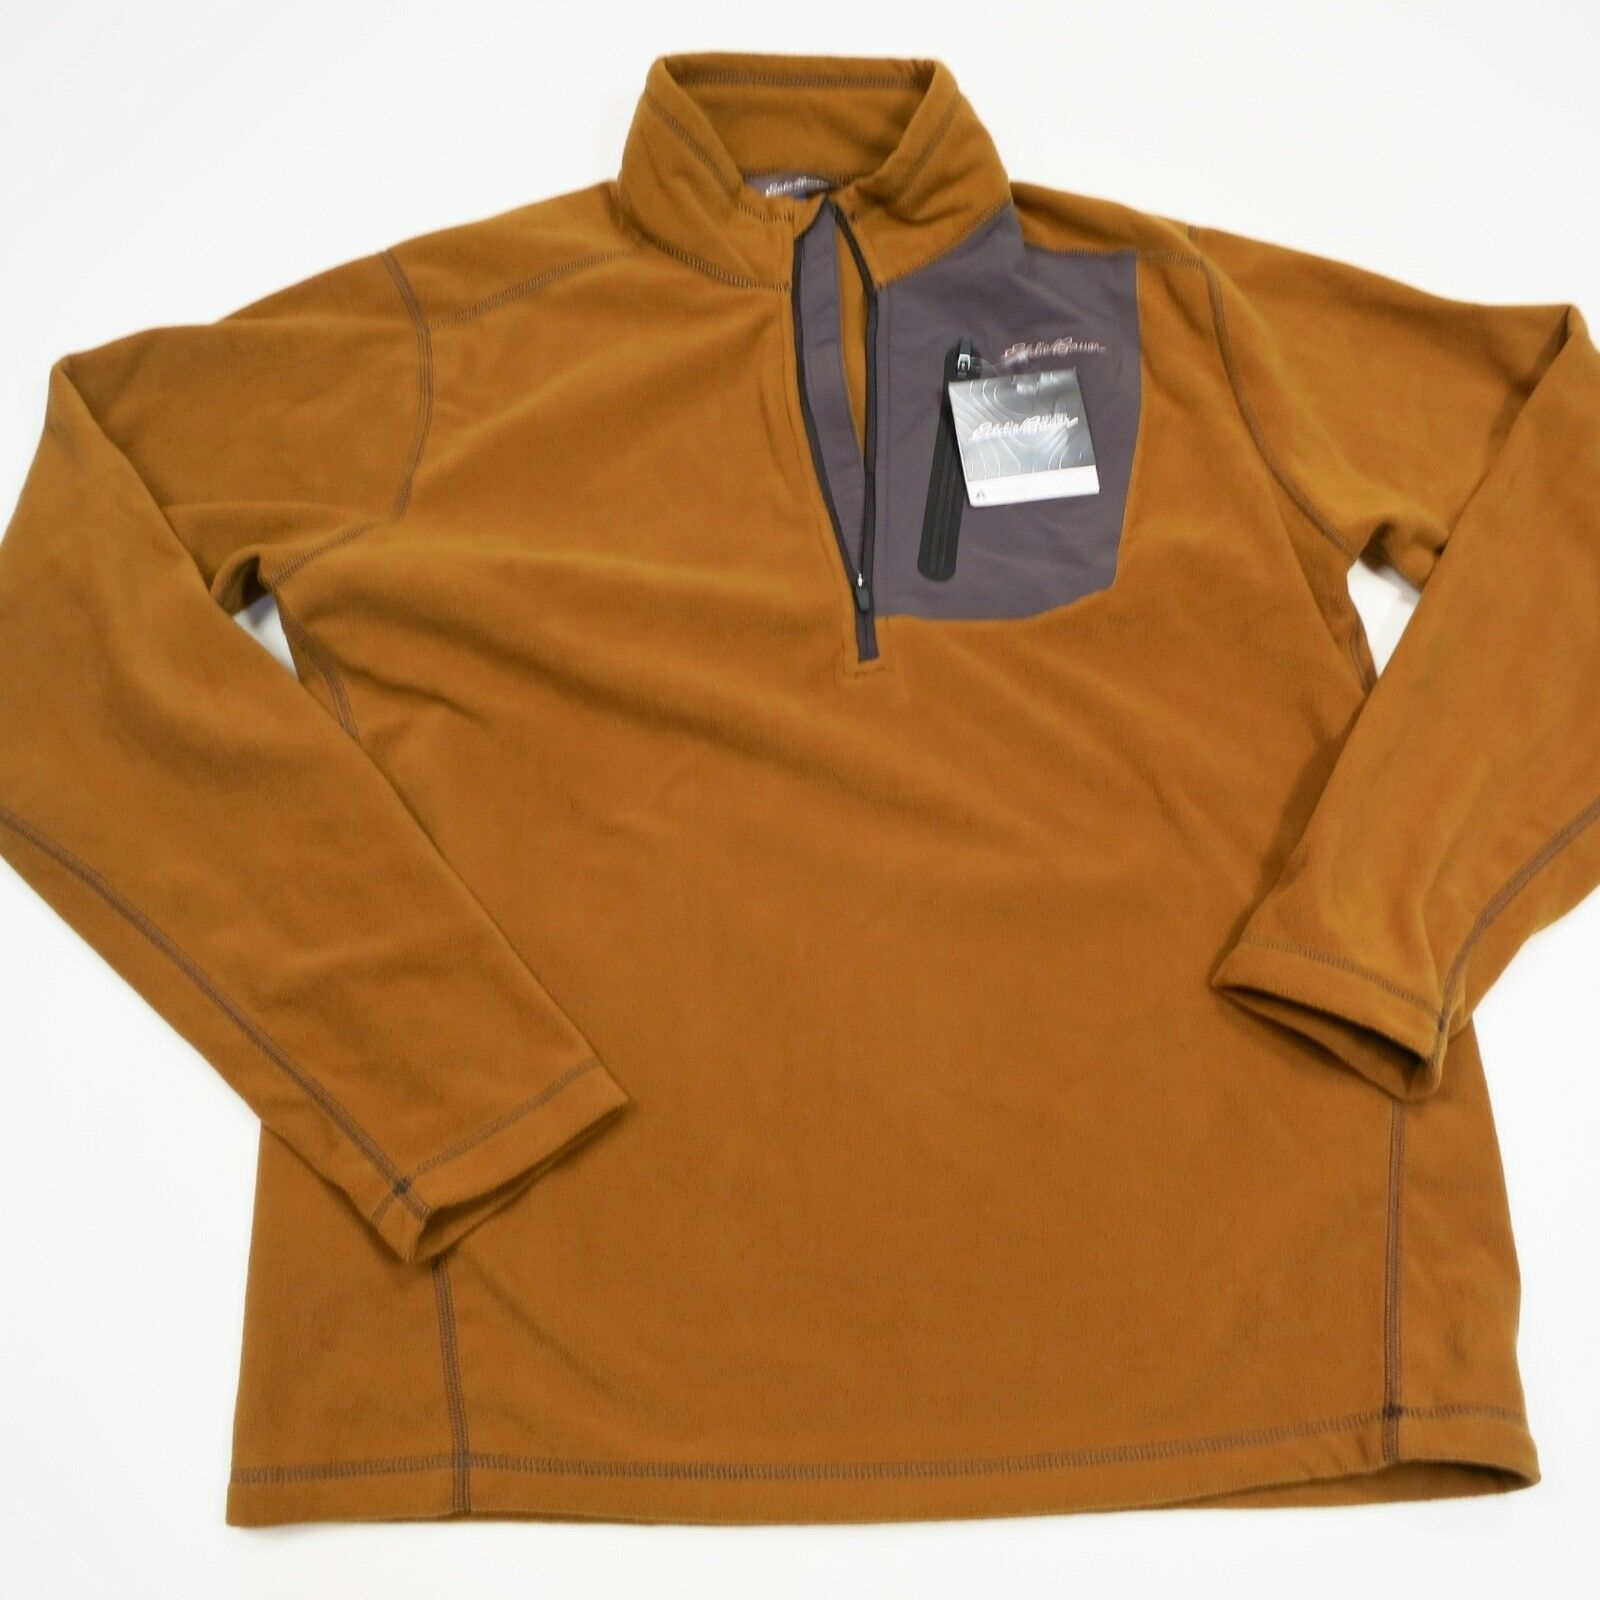 Men's Eddie Bauer Cloudlayer 1 4 Zip First Ascent Fleece Large Brown NEW